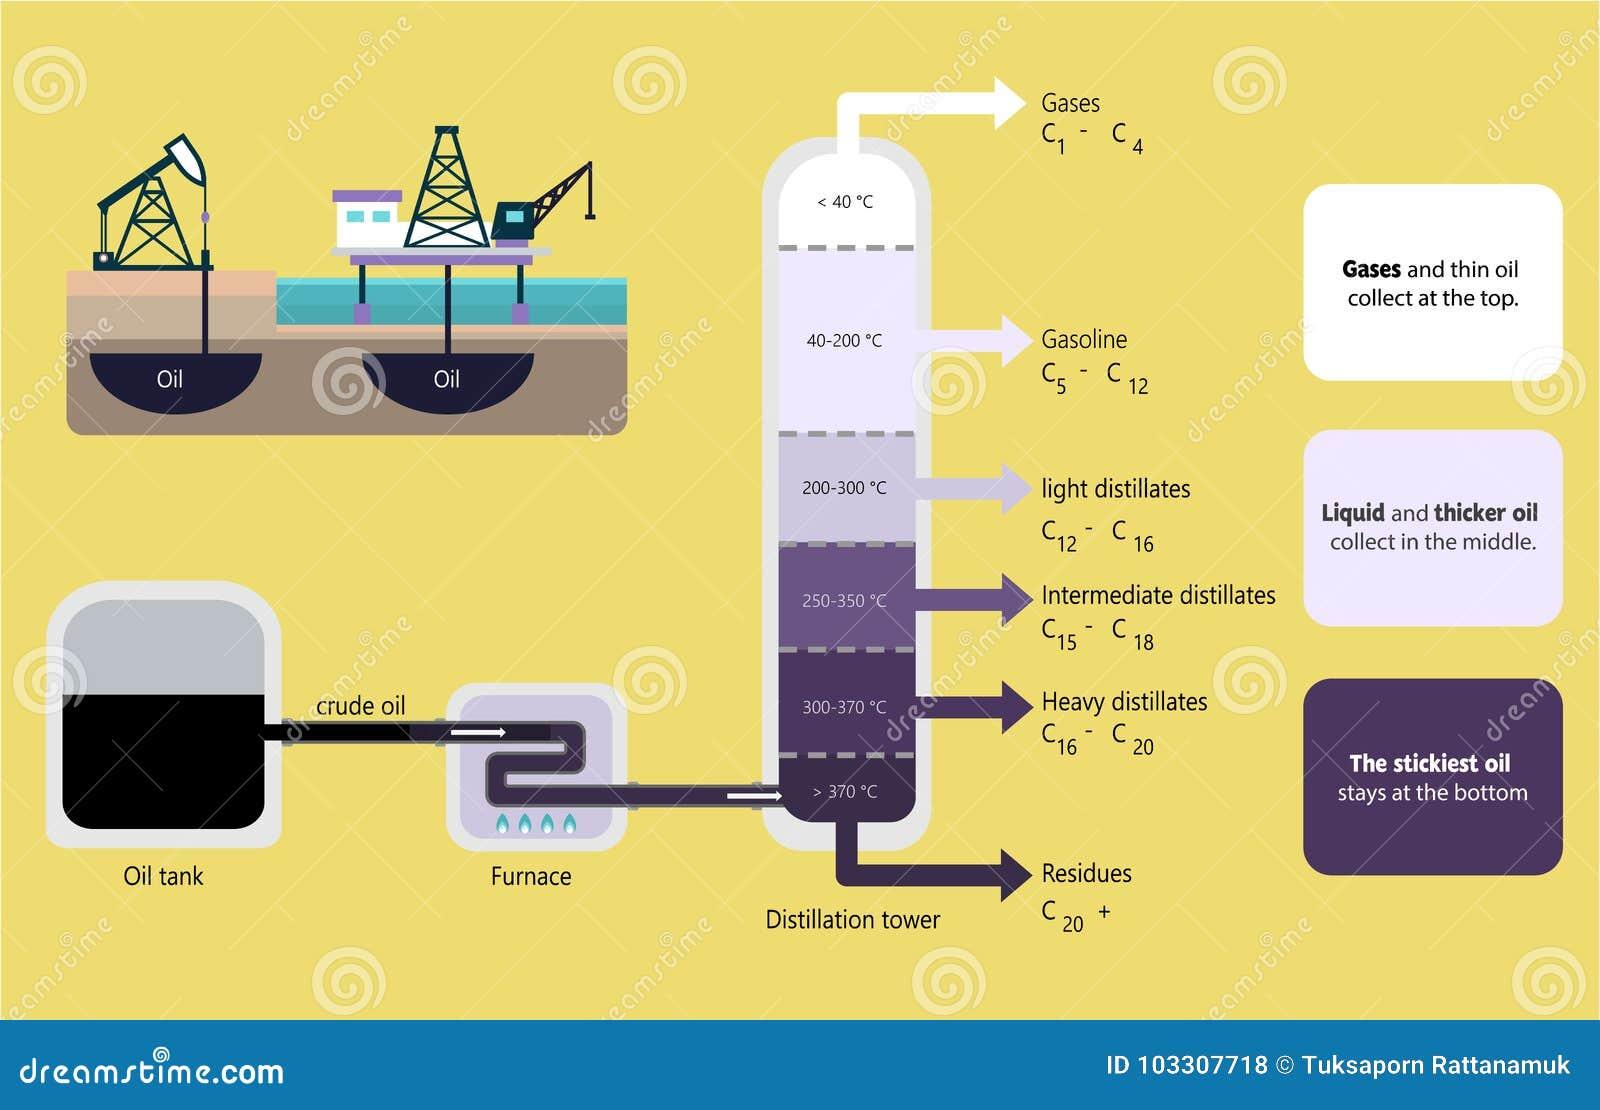 Fractional Distillation Crude Oil Diagram Illustration Fractional Distillation Crude Oil Diagram on Fractional Distillation Column